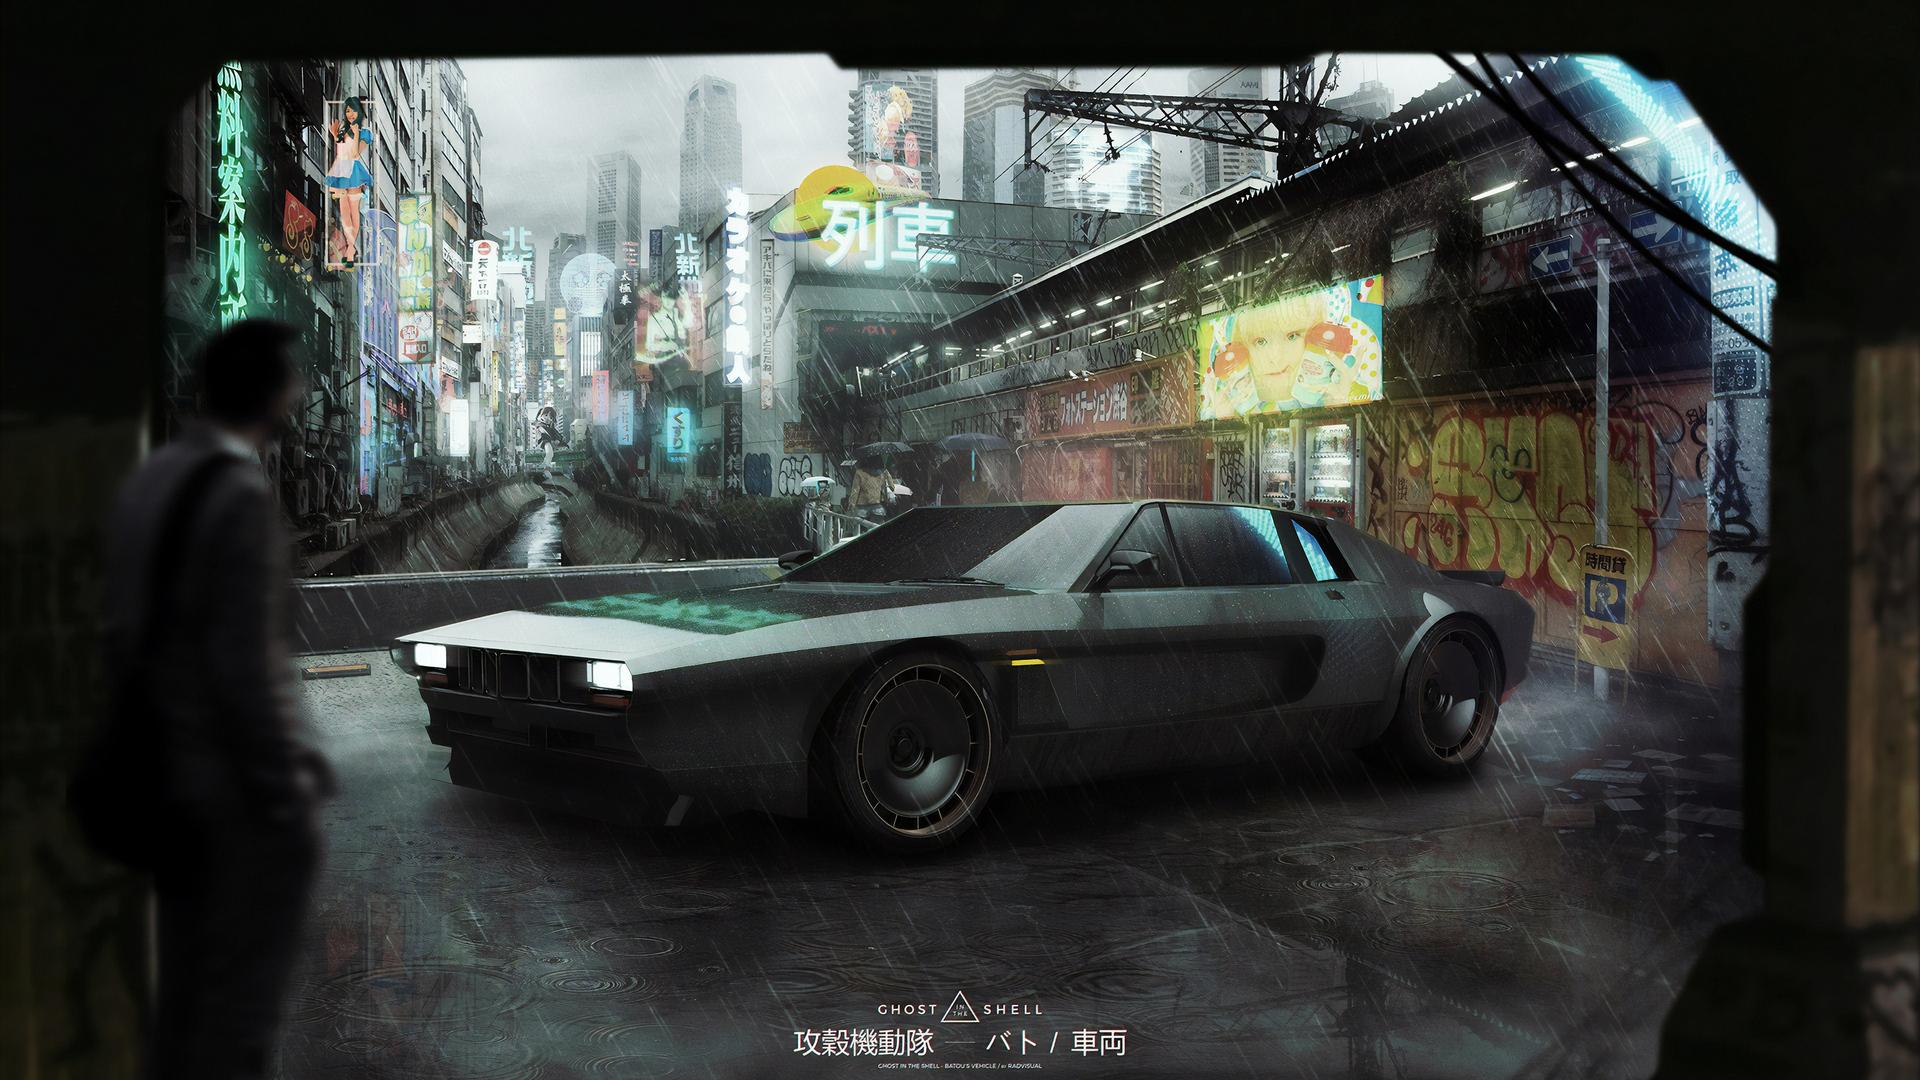 1920x1080 Ghost In The Shell Batous Car Laptop Full Hd 1080p Hd 4k